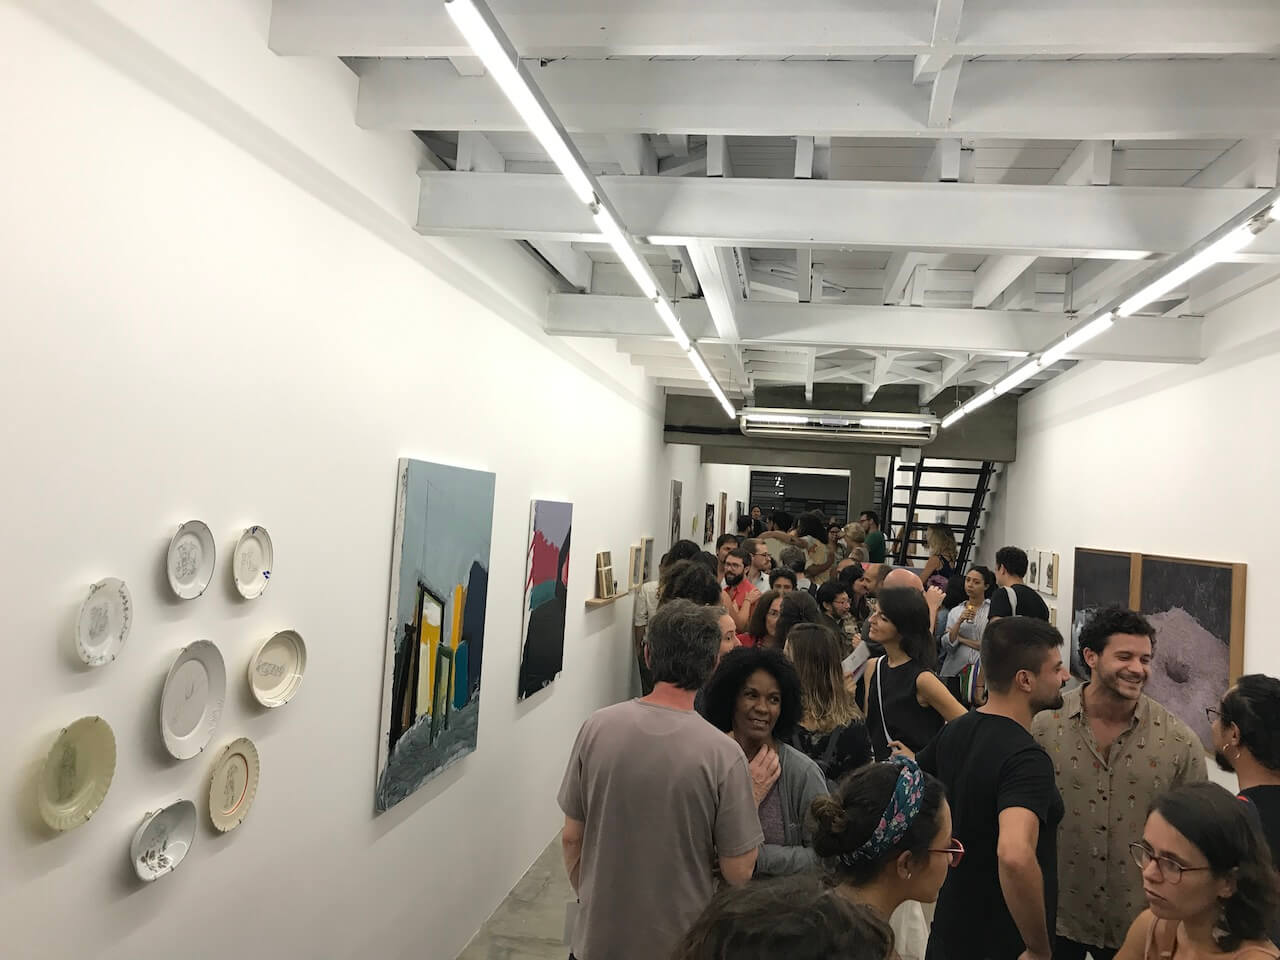 Artistas sem galeria 2018 na Sancovsky